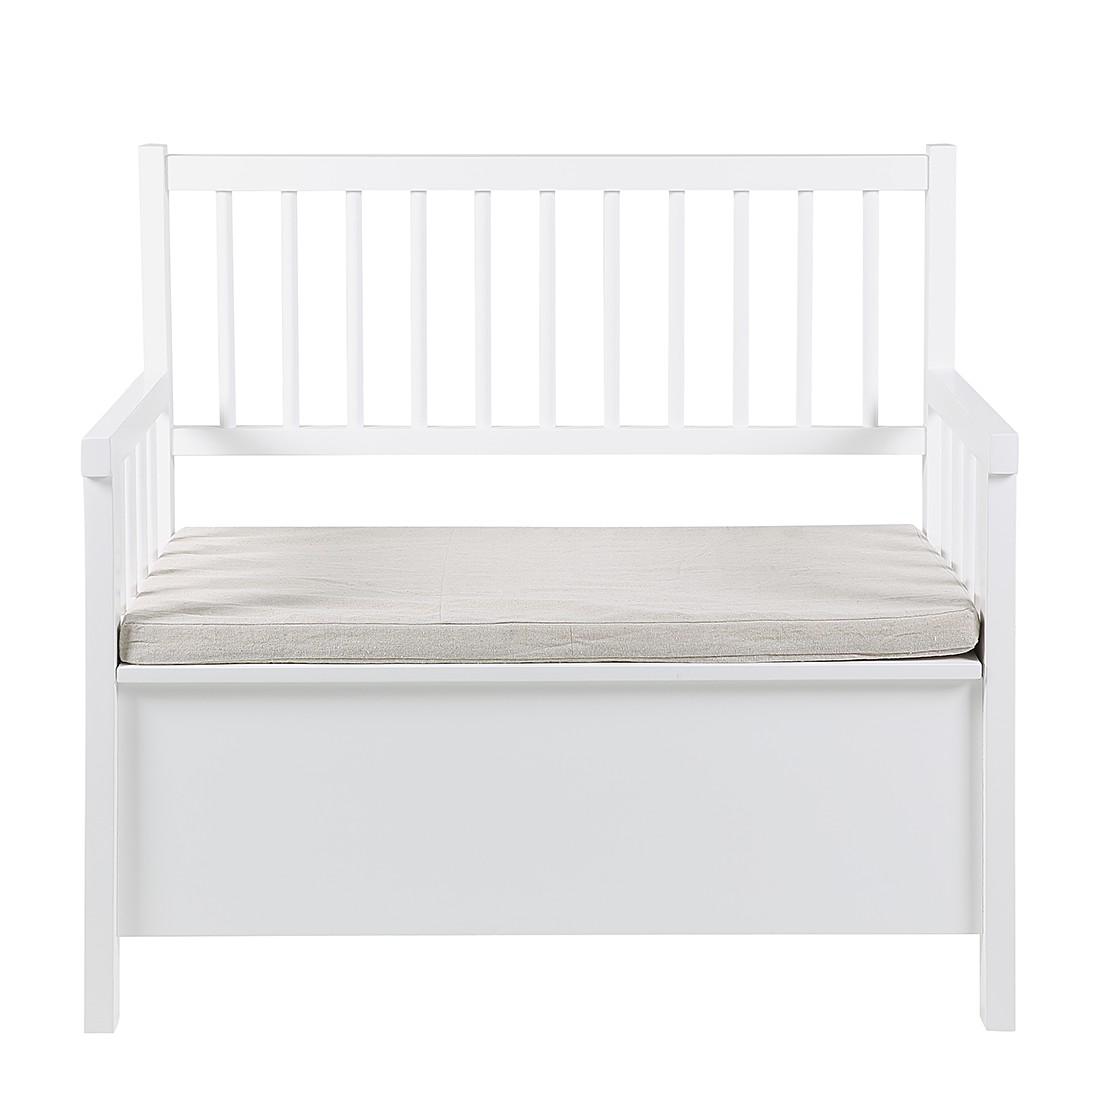 sitzbank adello wei sitztruhe truhe sitzhocker schutruhe ebay. Black Bedroom Furniture Sets. Home Design Ideas